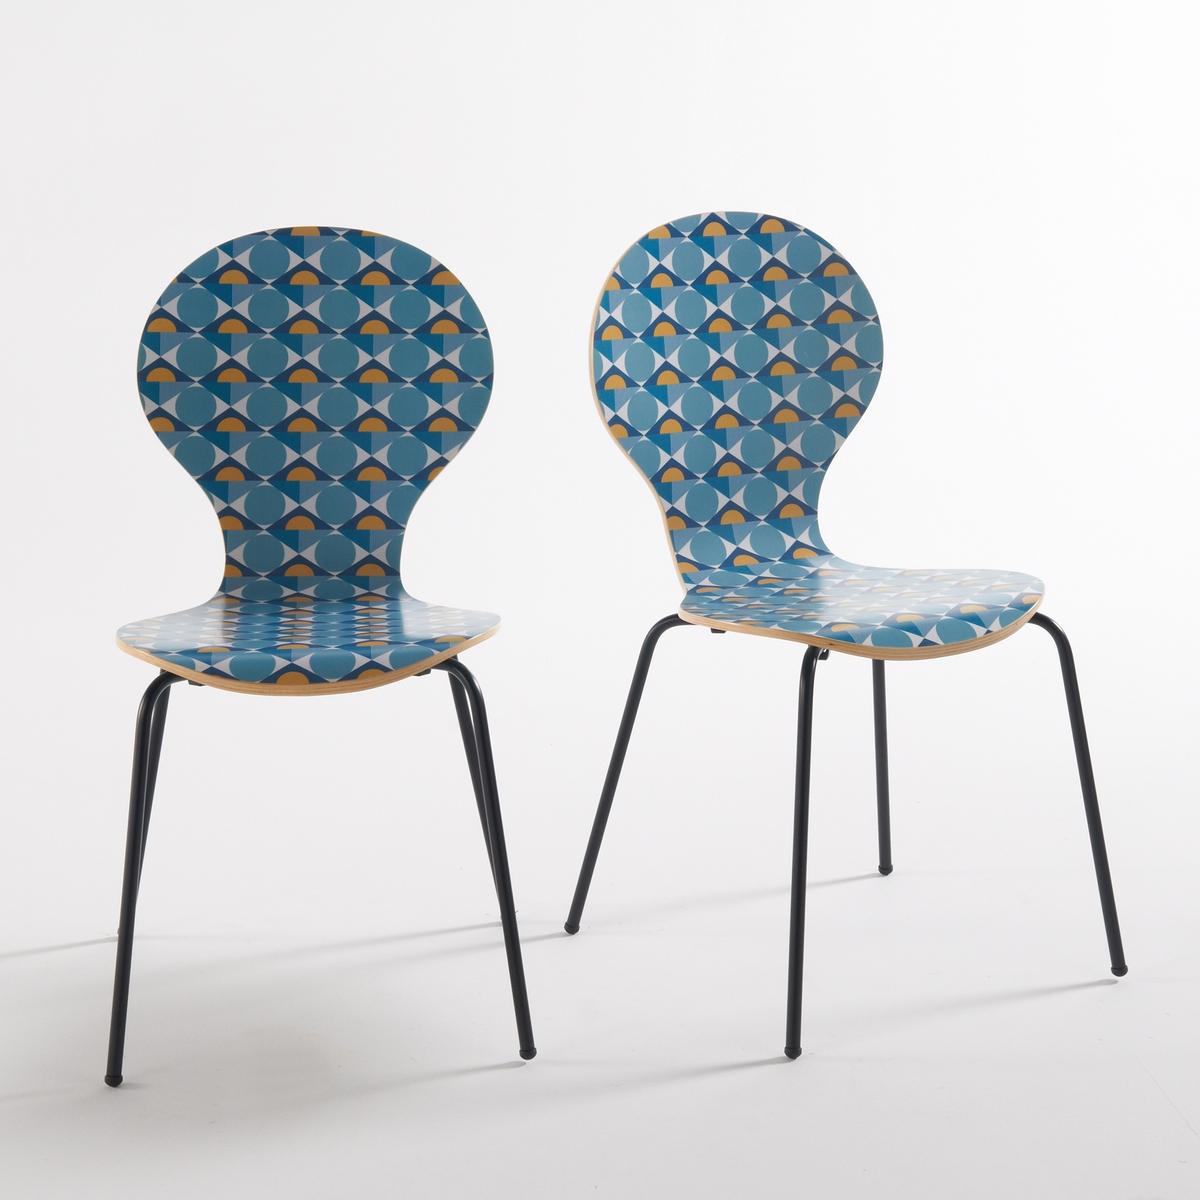 2 стула Barting с рисунком